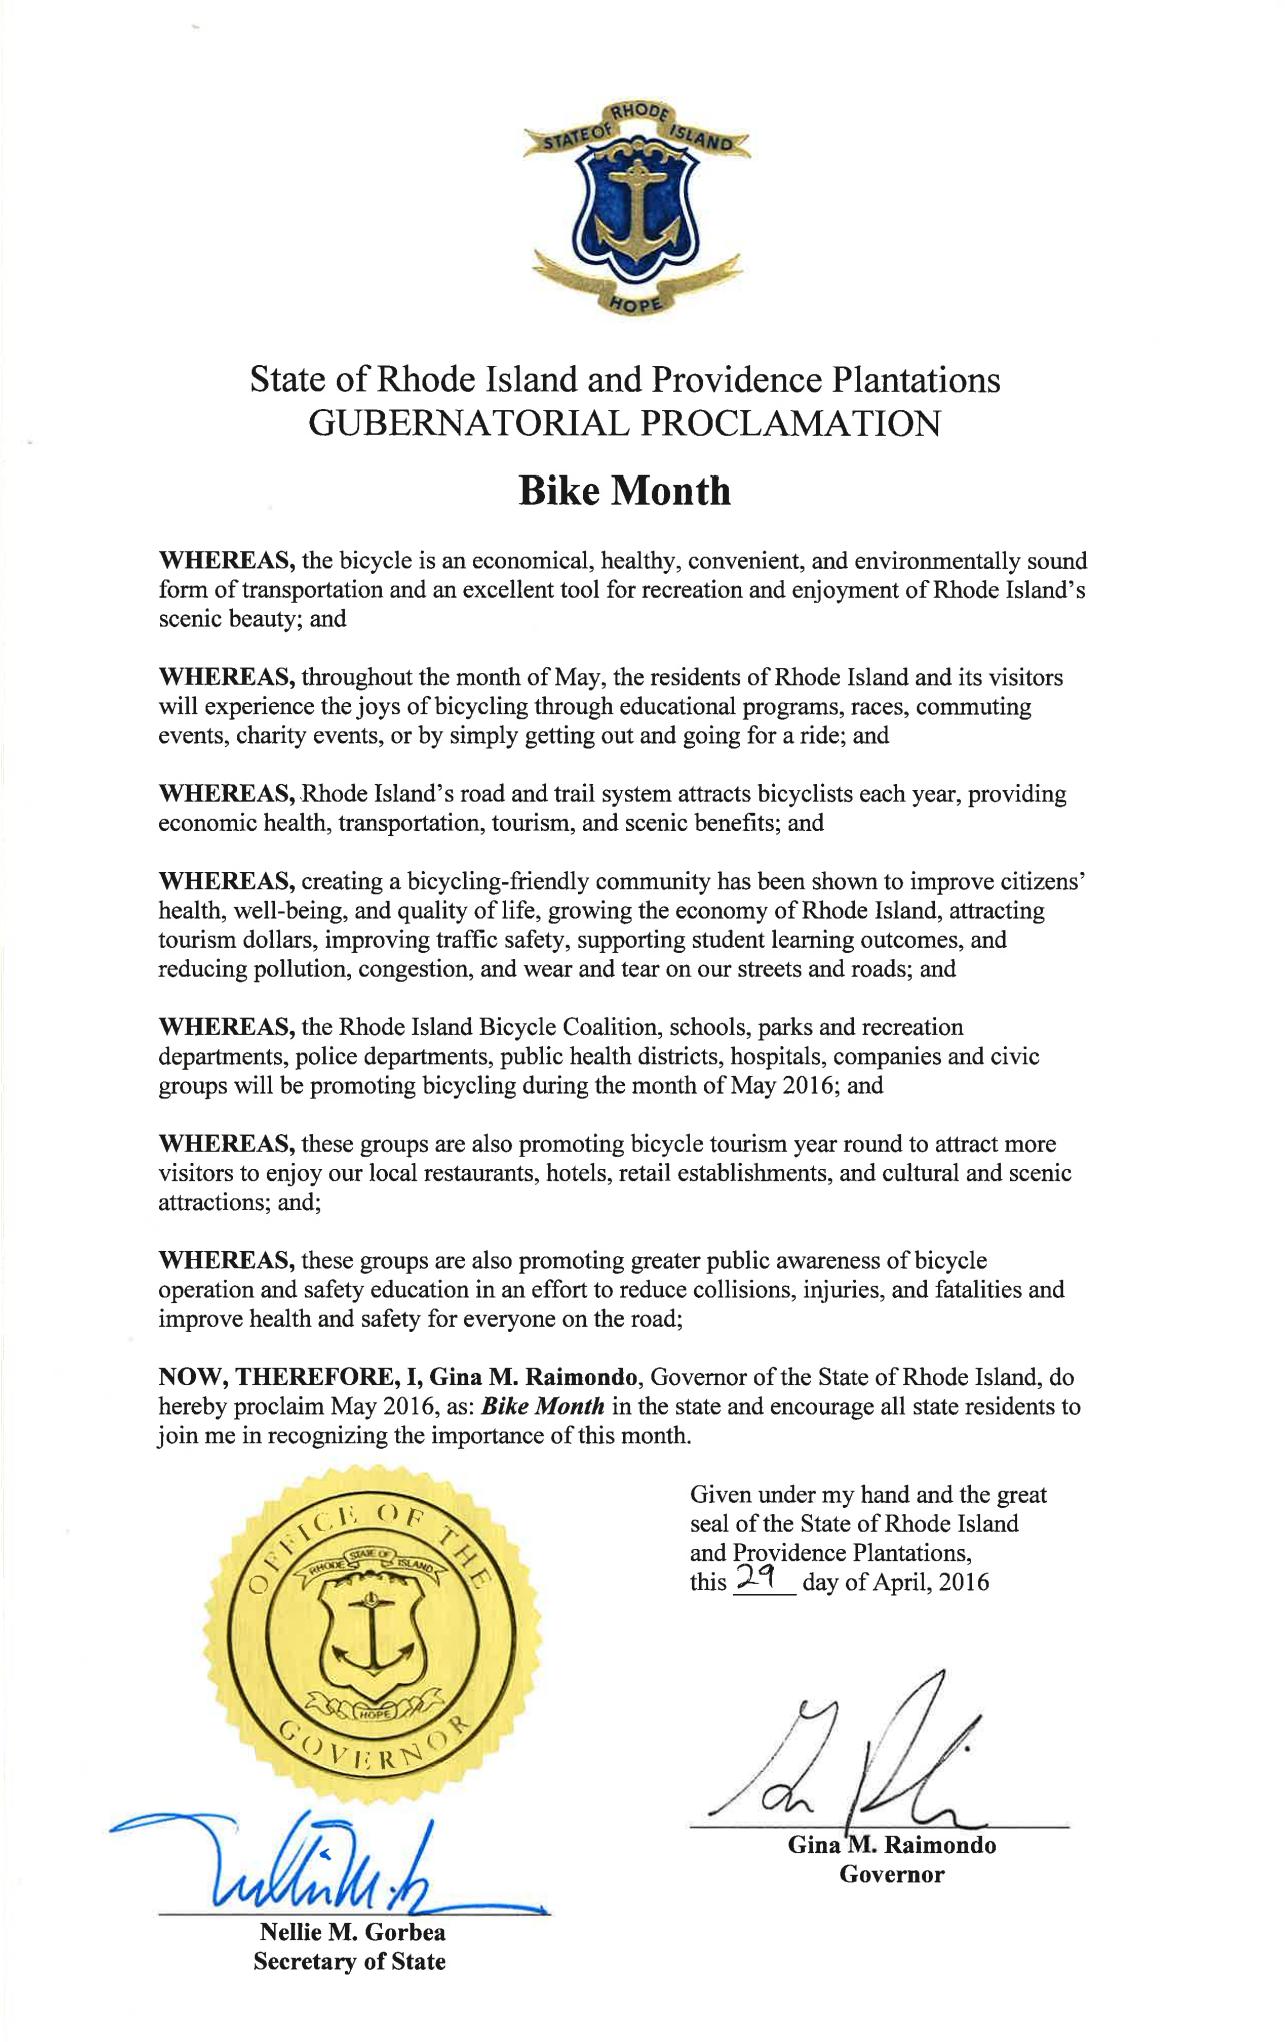 Governor Raimondo proclamation 2016